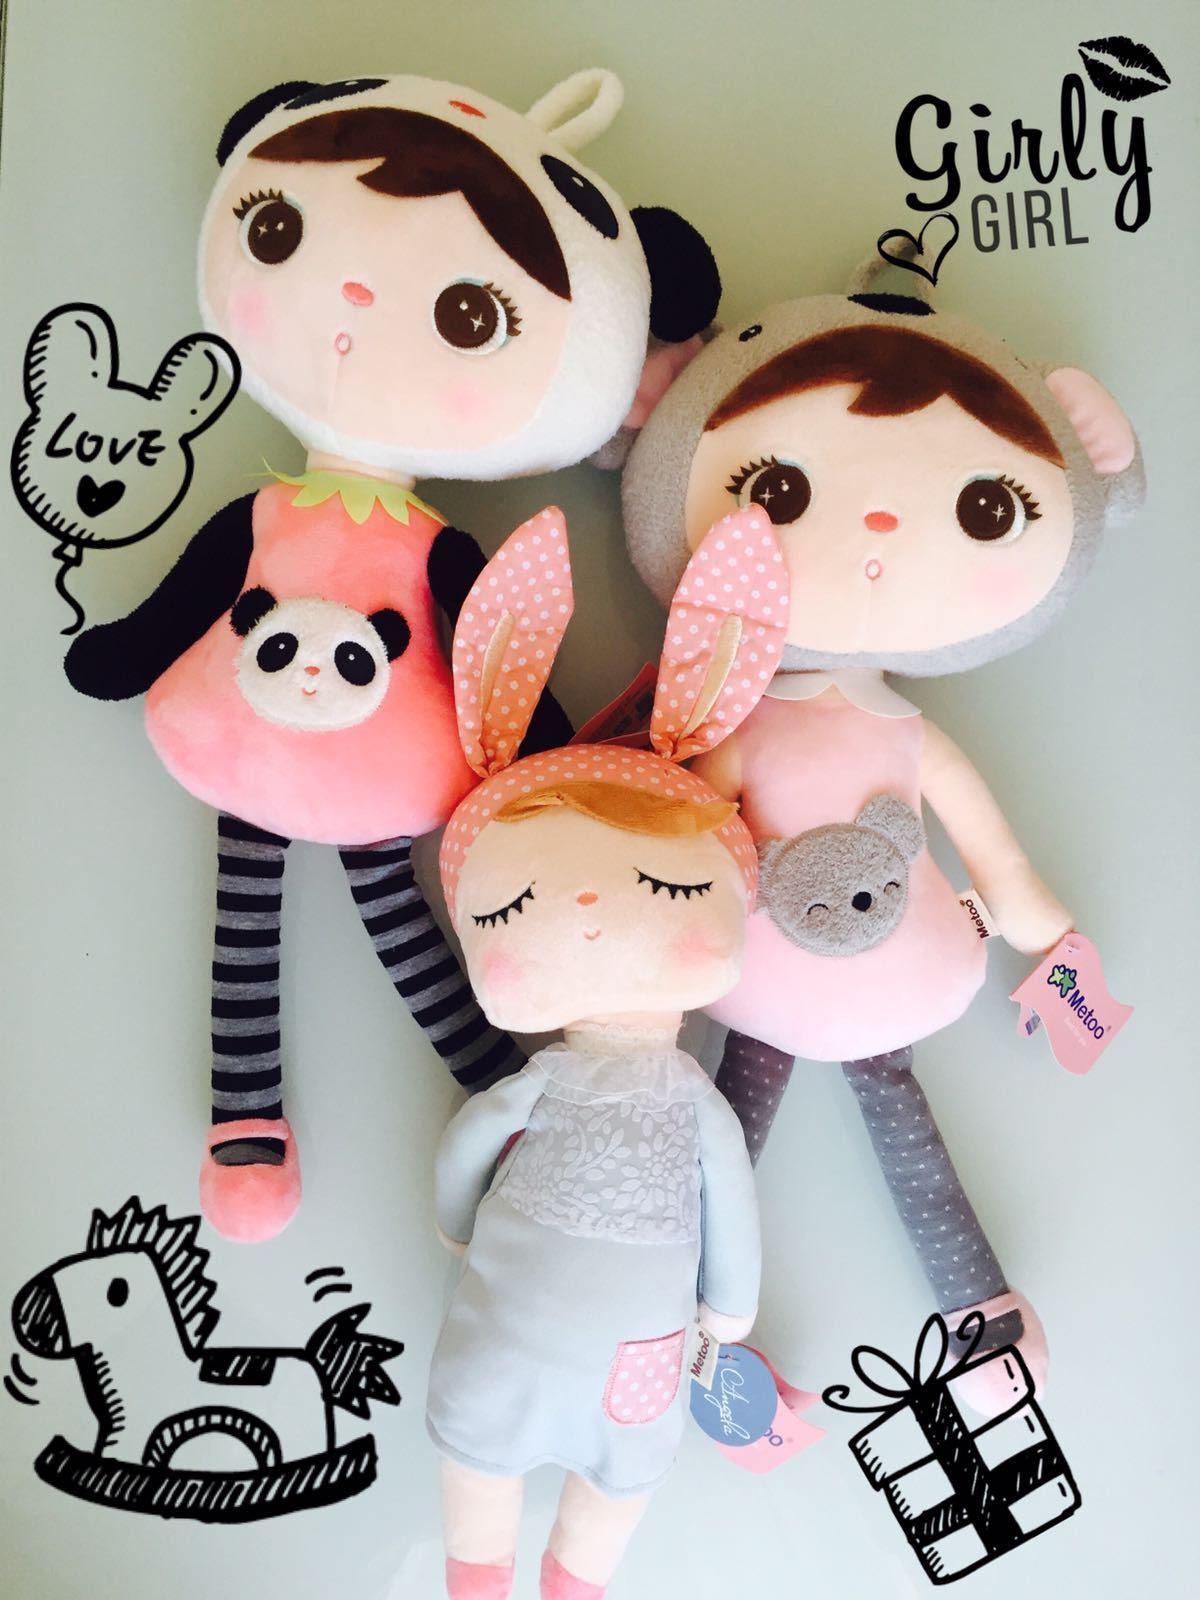 Baby Plüschpuppe, Metoo orginal Doll, Angela, Panda, Koala  |  Neuer Markt